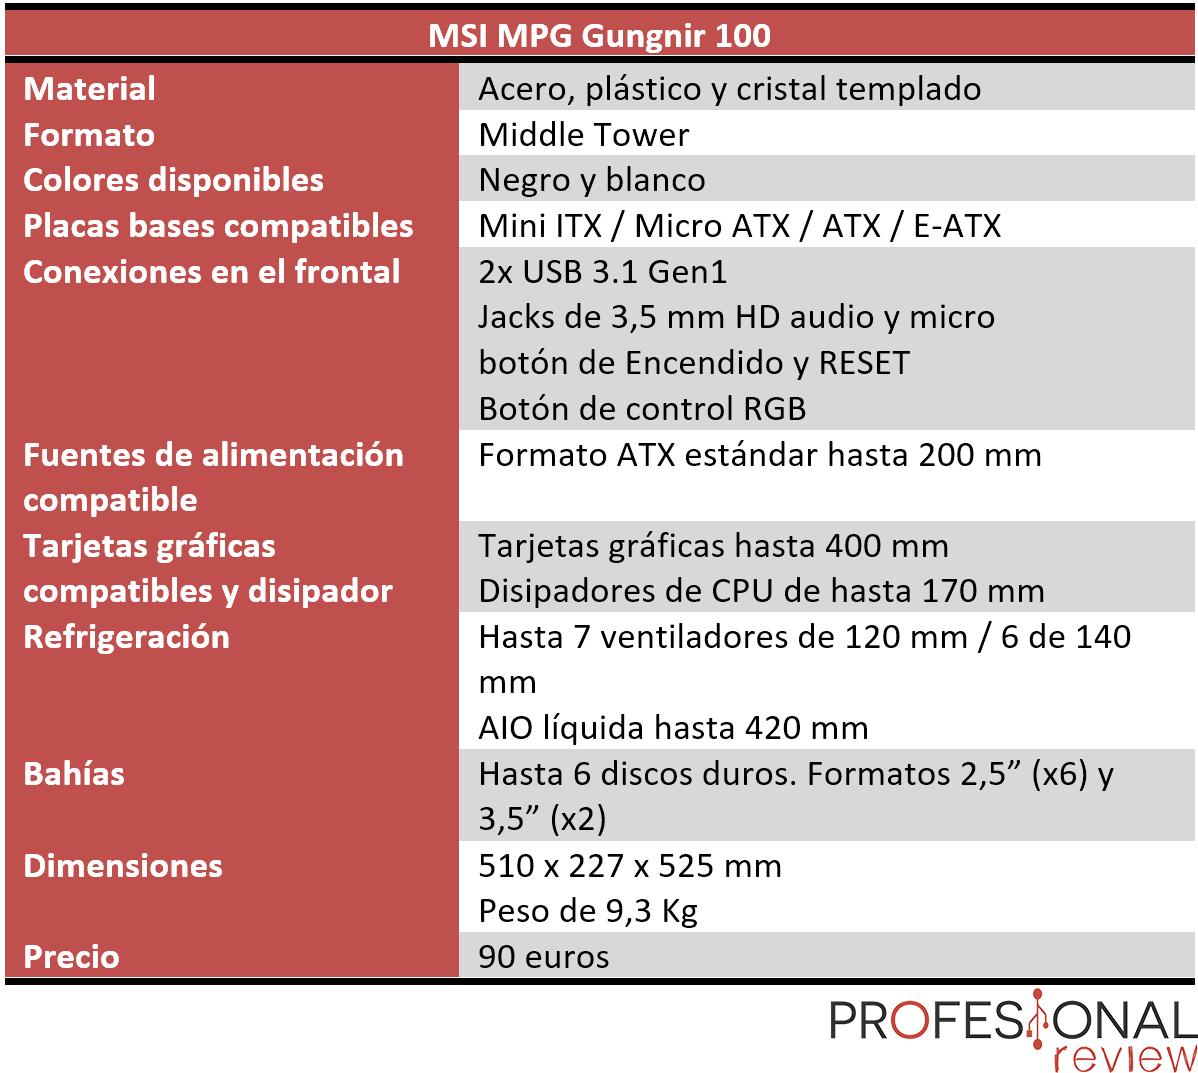 MSI MPG Gungnir 100 características